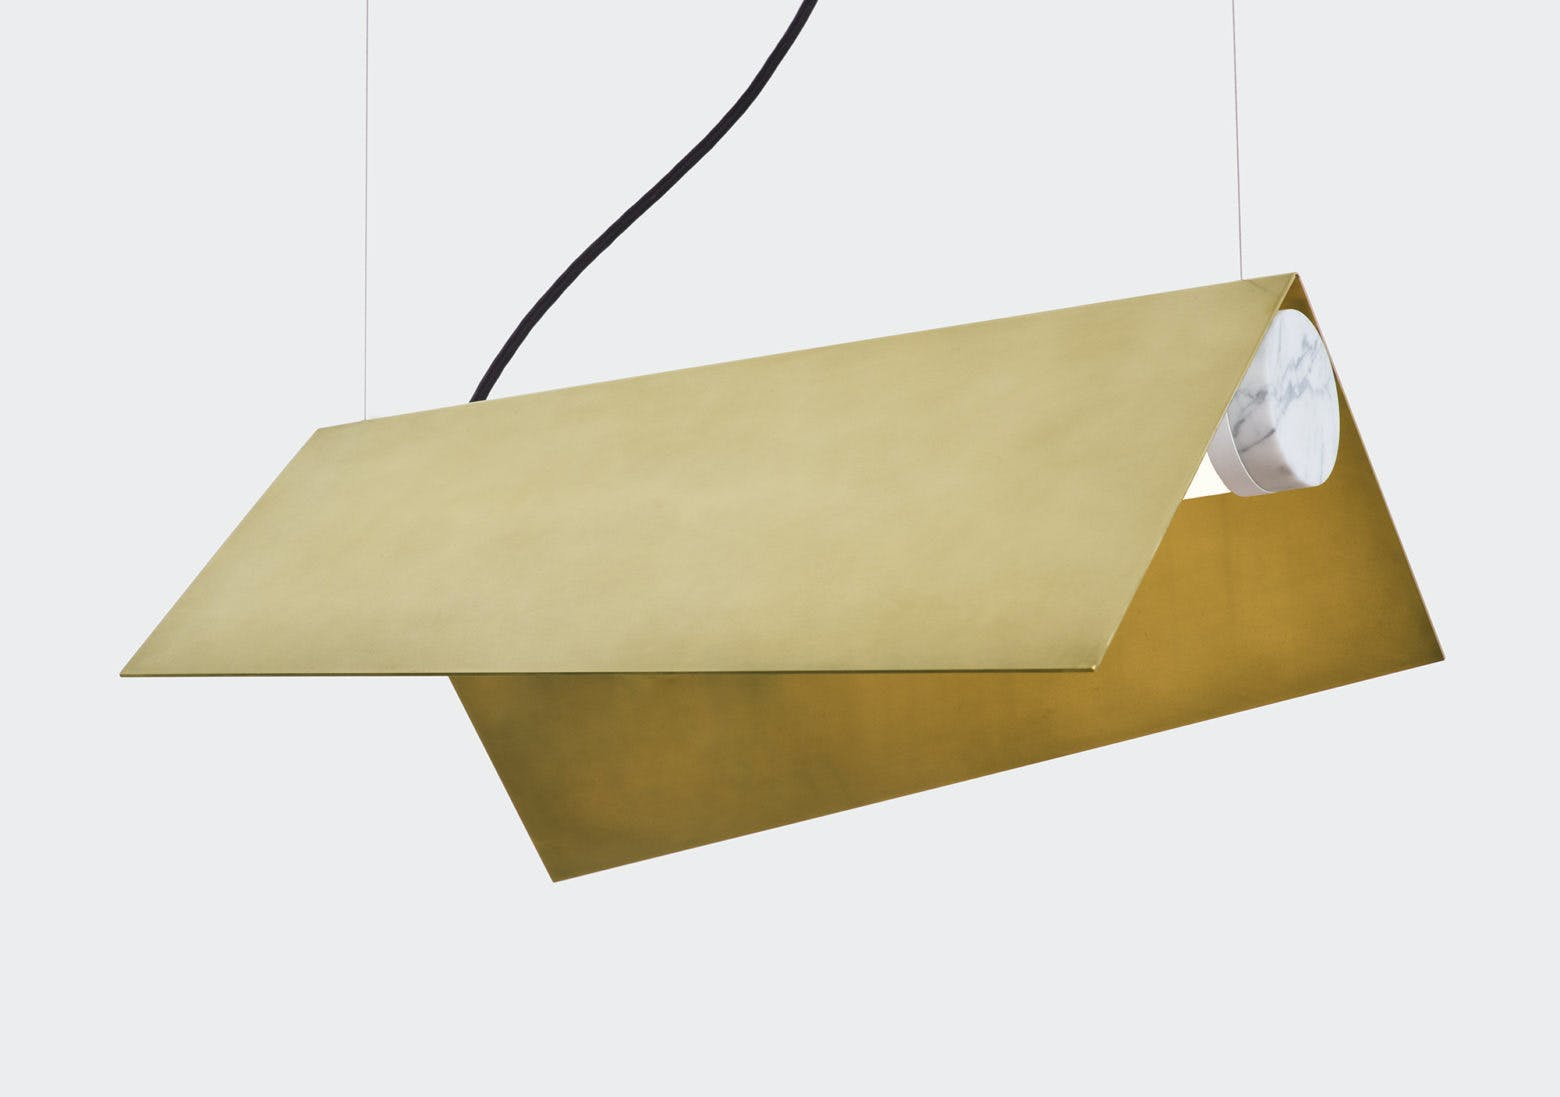 lambert & fils clark suspension hanging lamp detail haute living